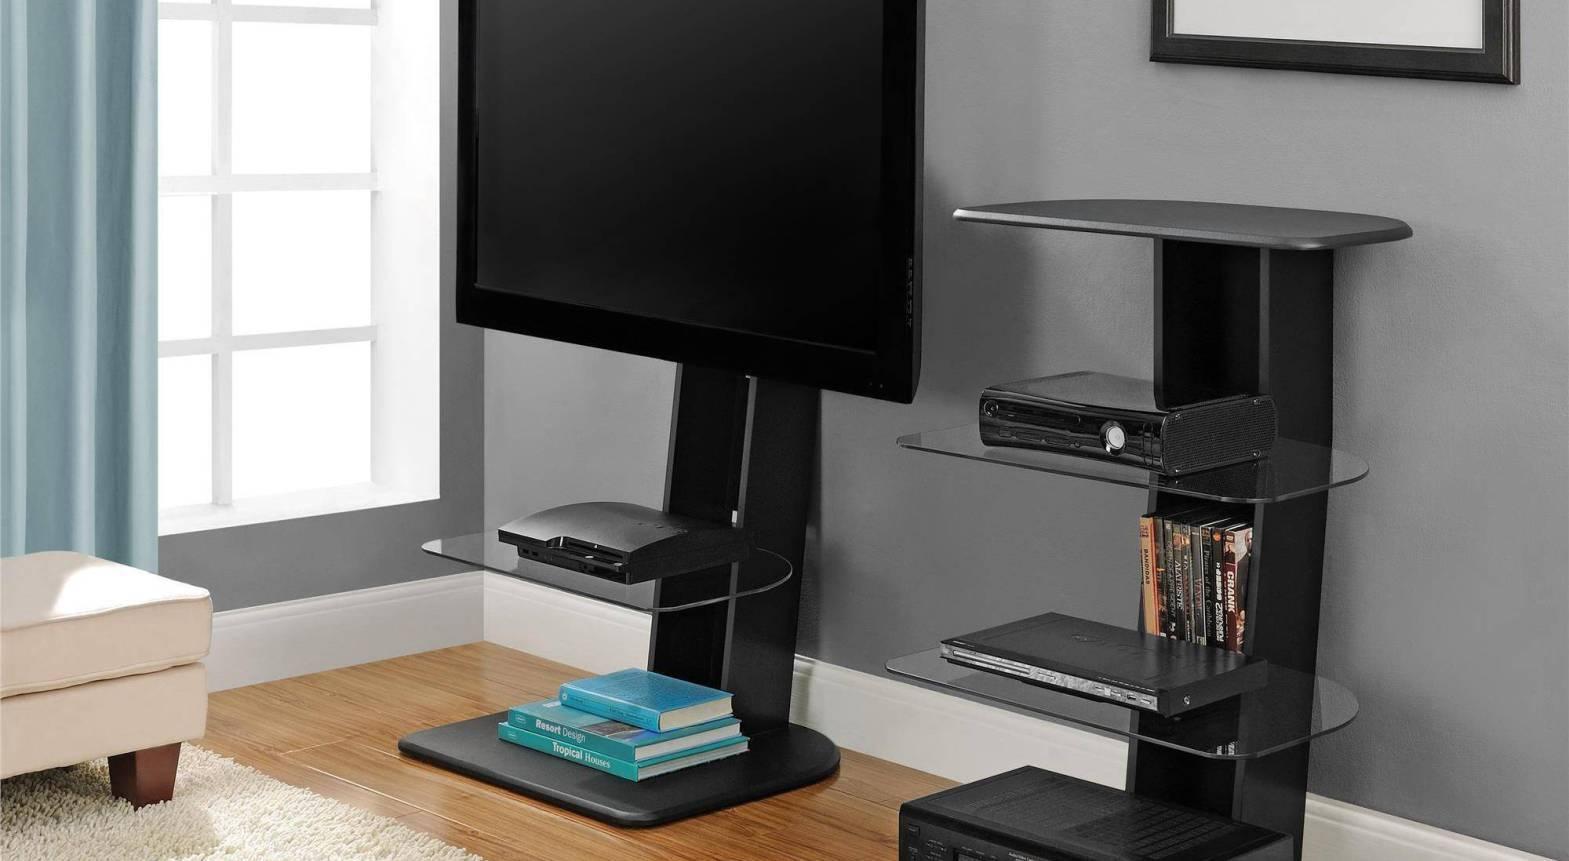 Tv : 24 Inch Corner Tv Stands Finest 24 Inch Corner Tv Stands regarding 24 Inch Corner Tv Stands (Image 9 of 15)